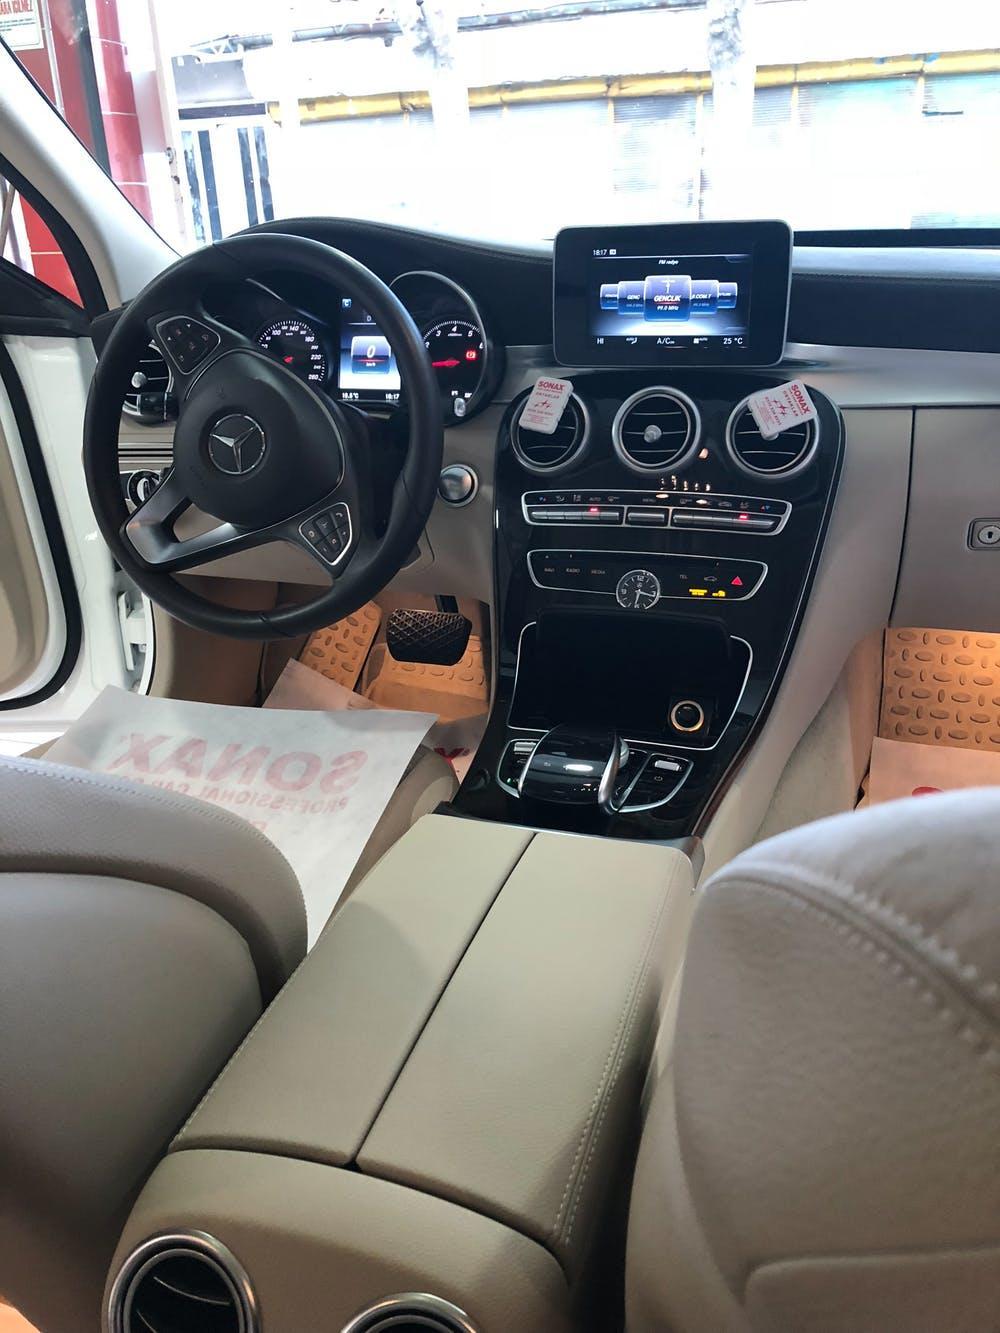 MERCEDES C 2016 Model Benzin Otomatik Vites Kiralik Araç - B343